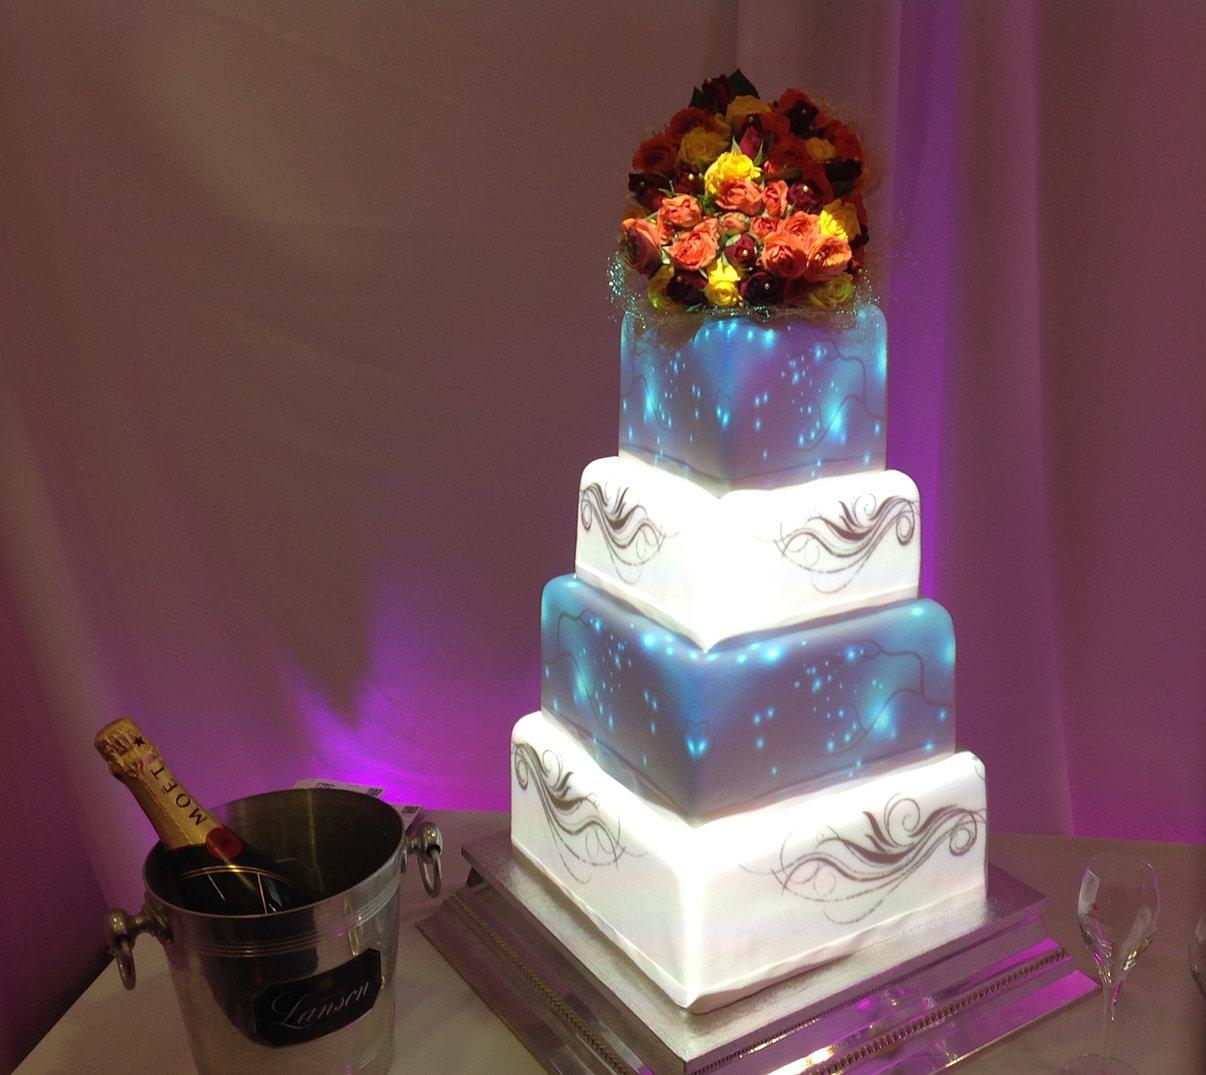 projection mapped wedding cakes uk. Black Bedroom Furniture Sets. Home Design Ideas